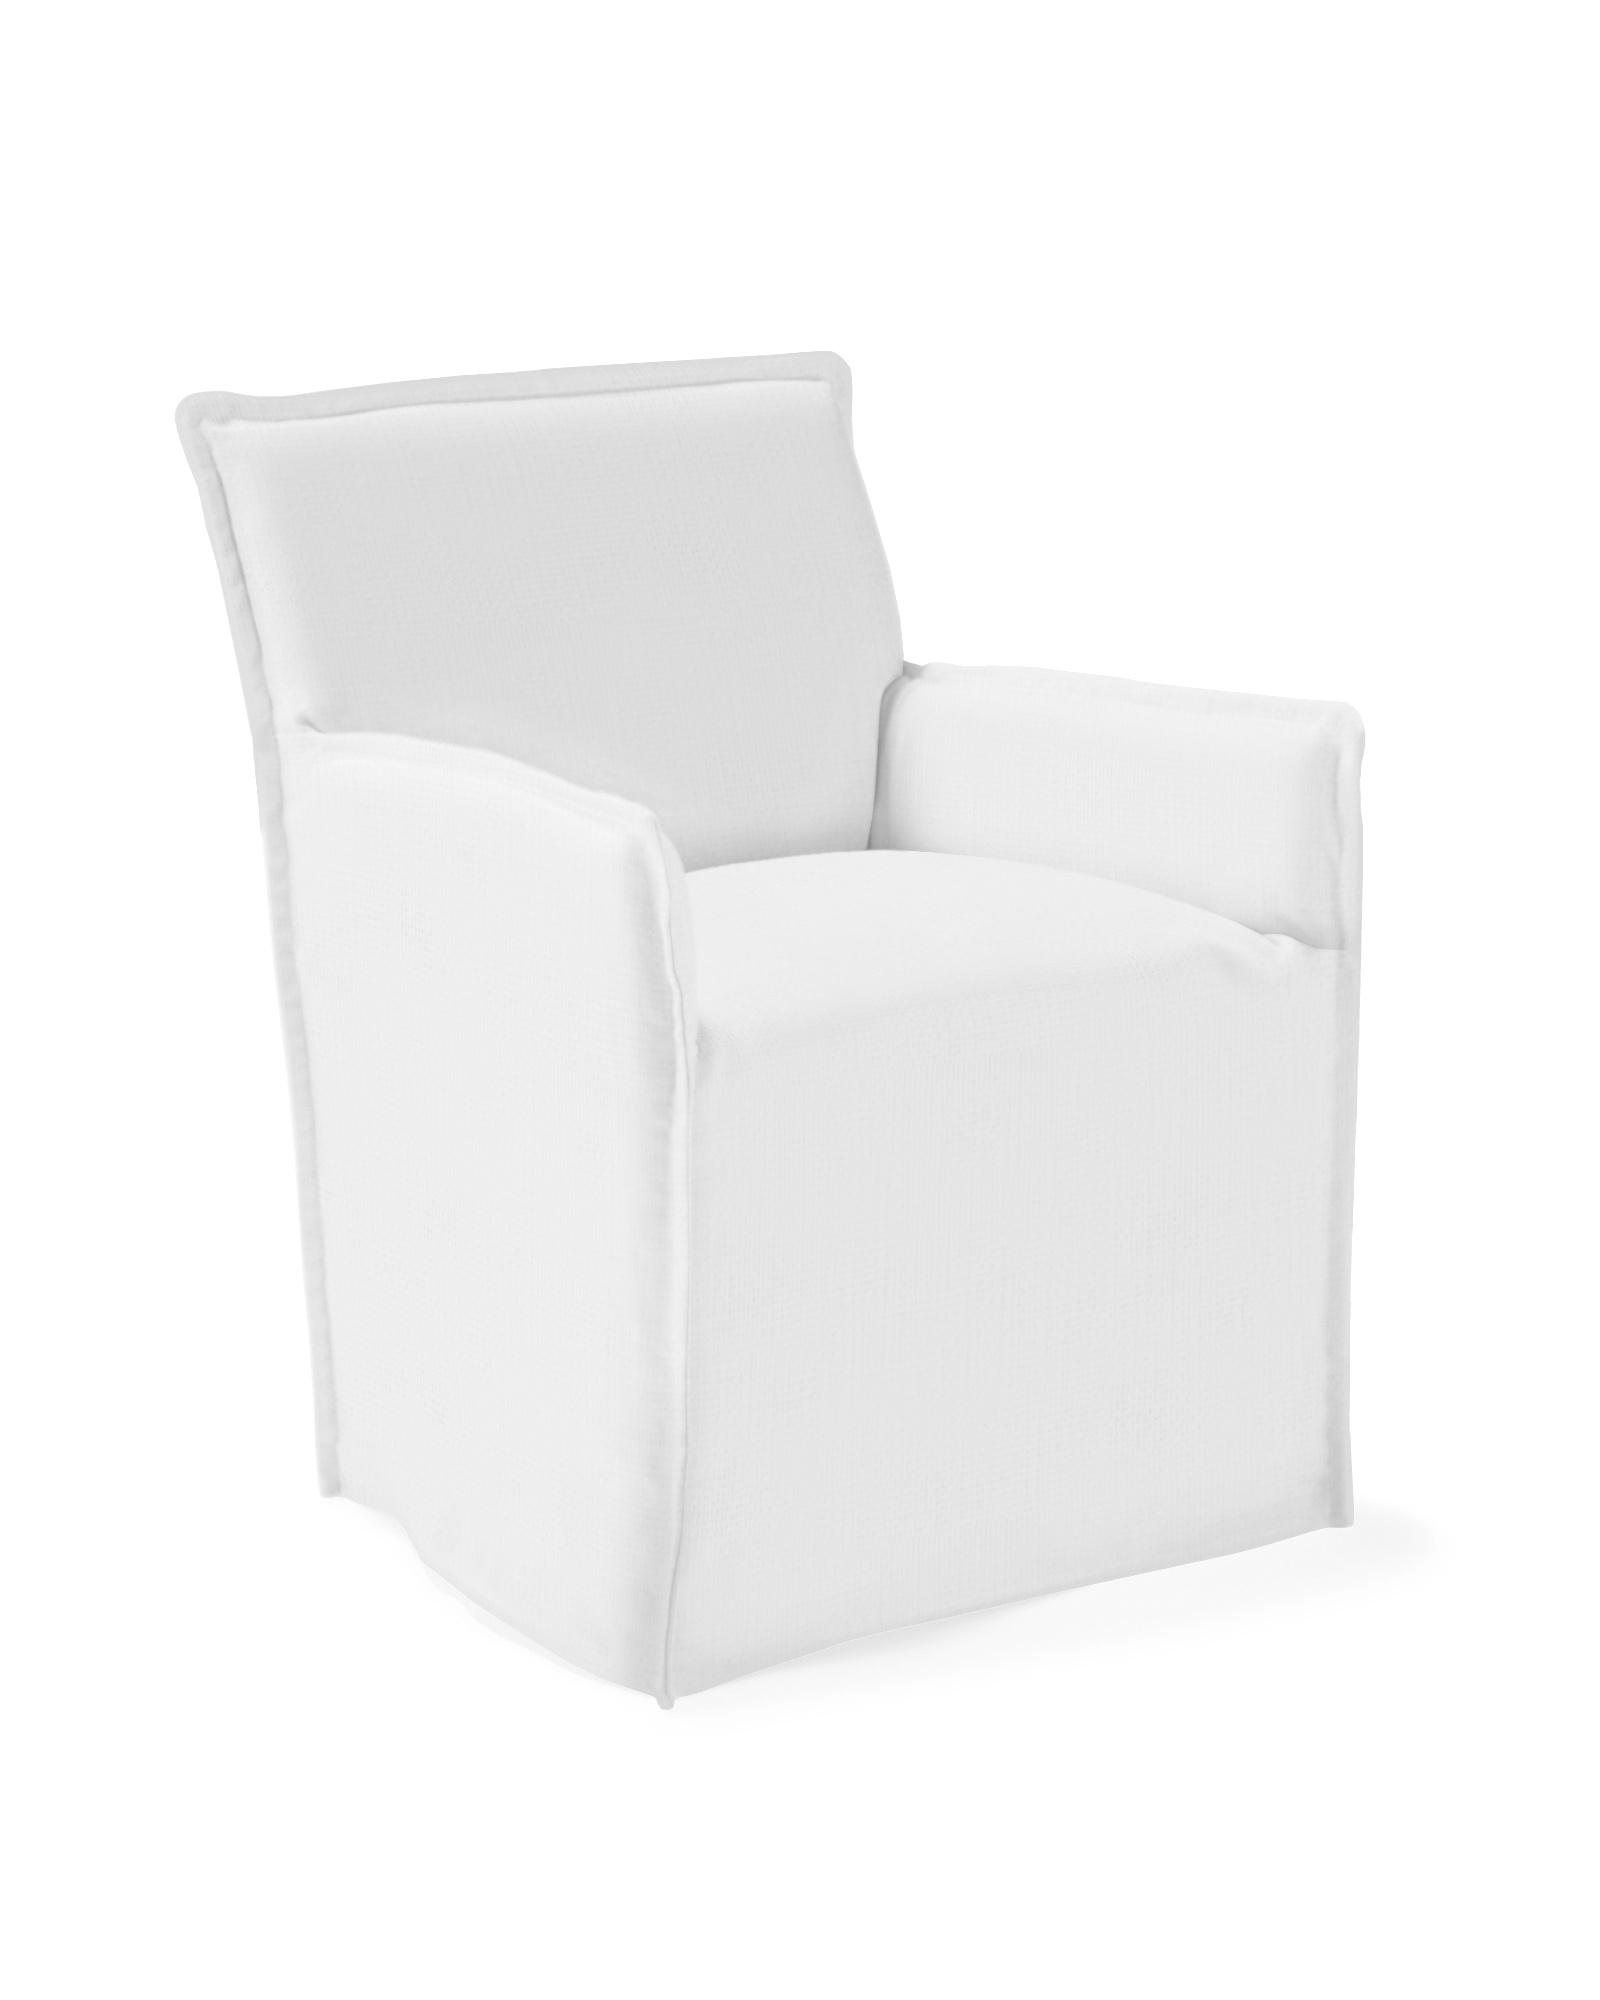 Sundial Outdoor Armchair - Slipcovered